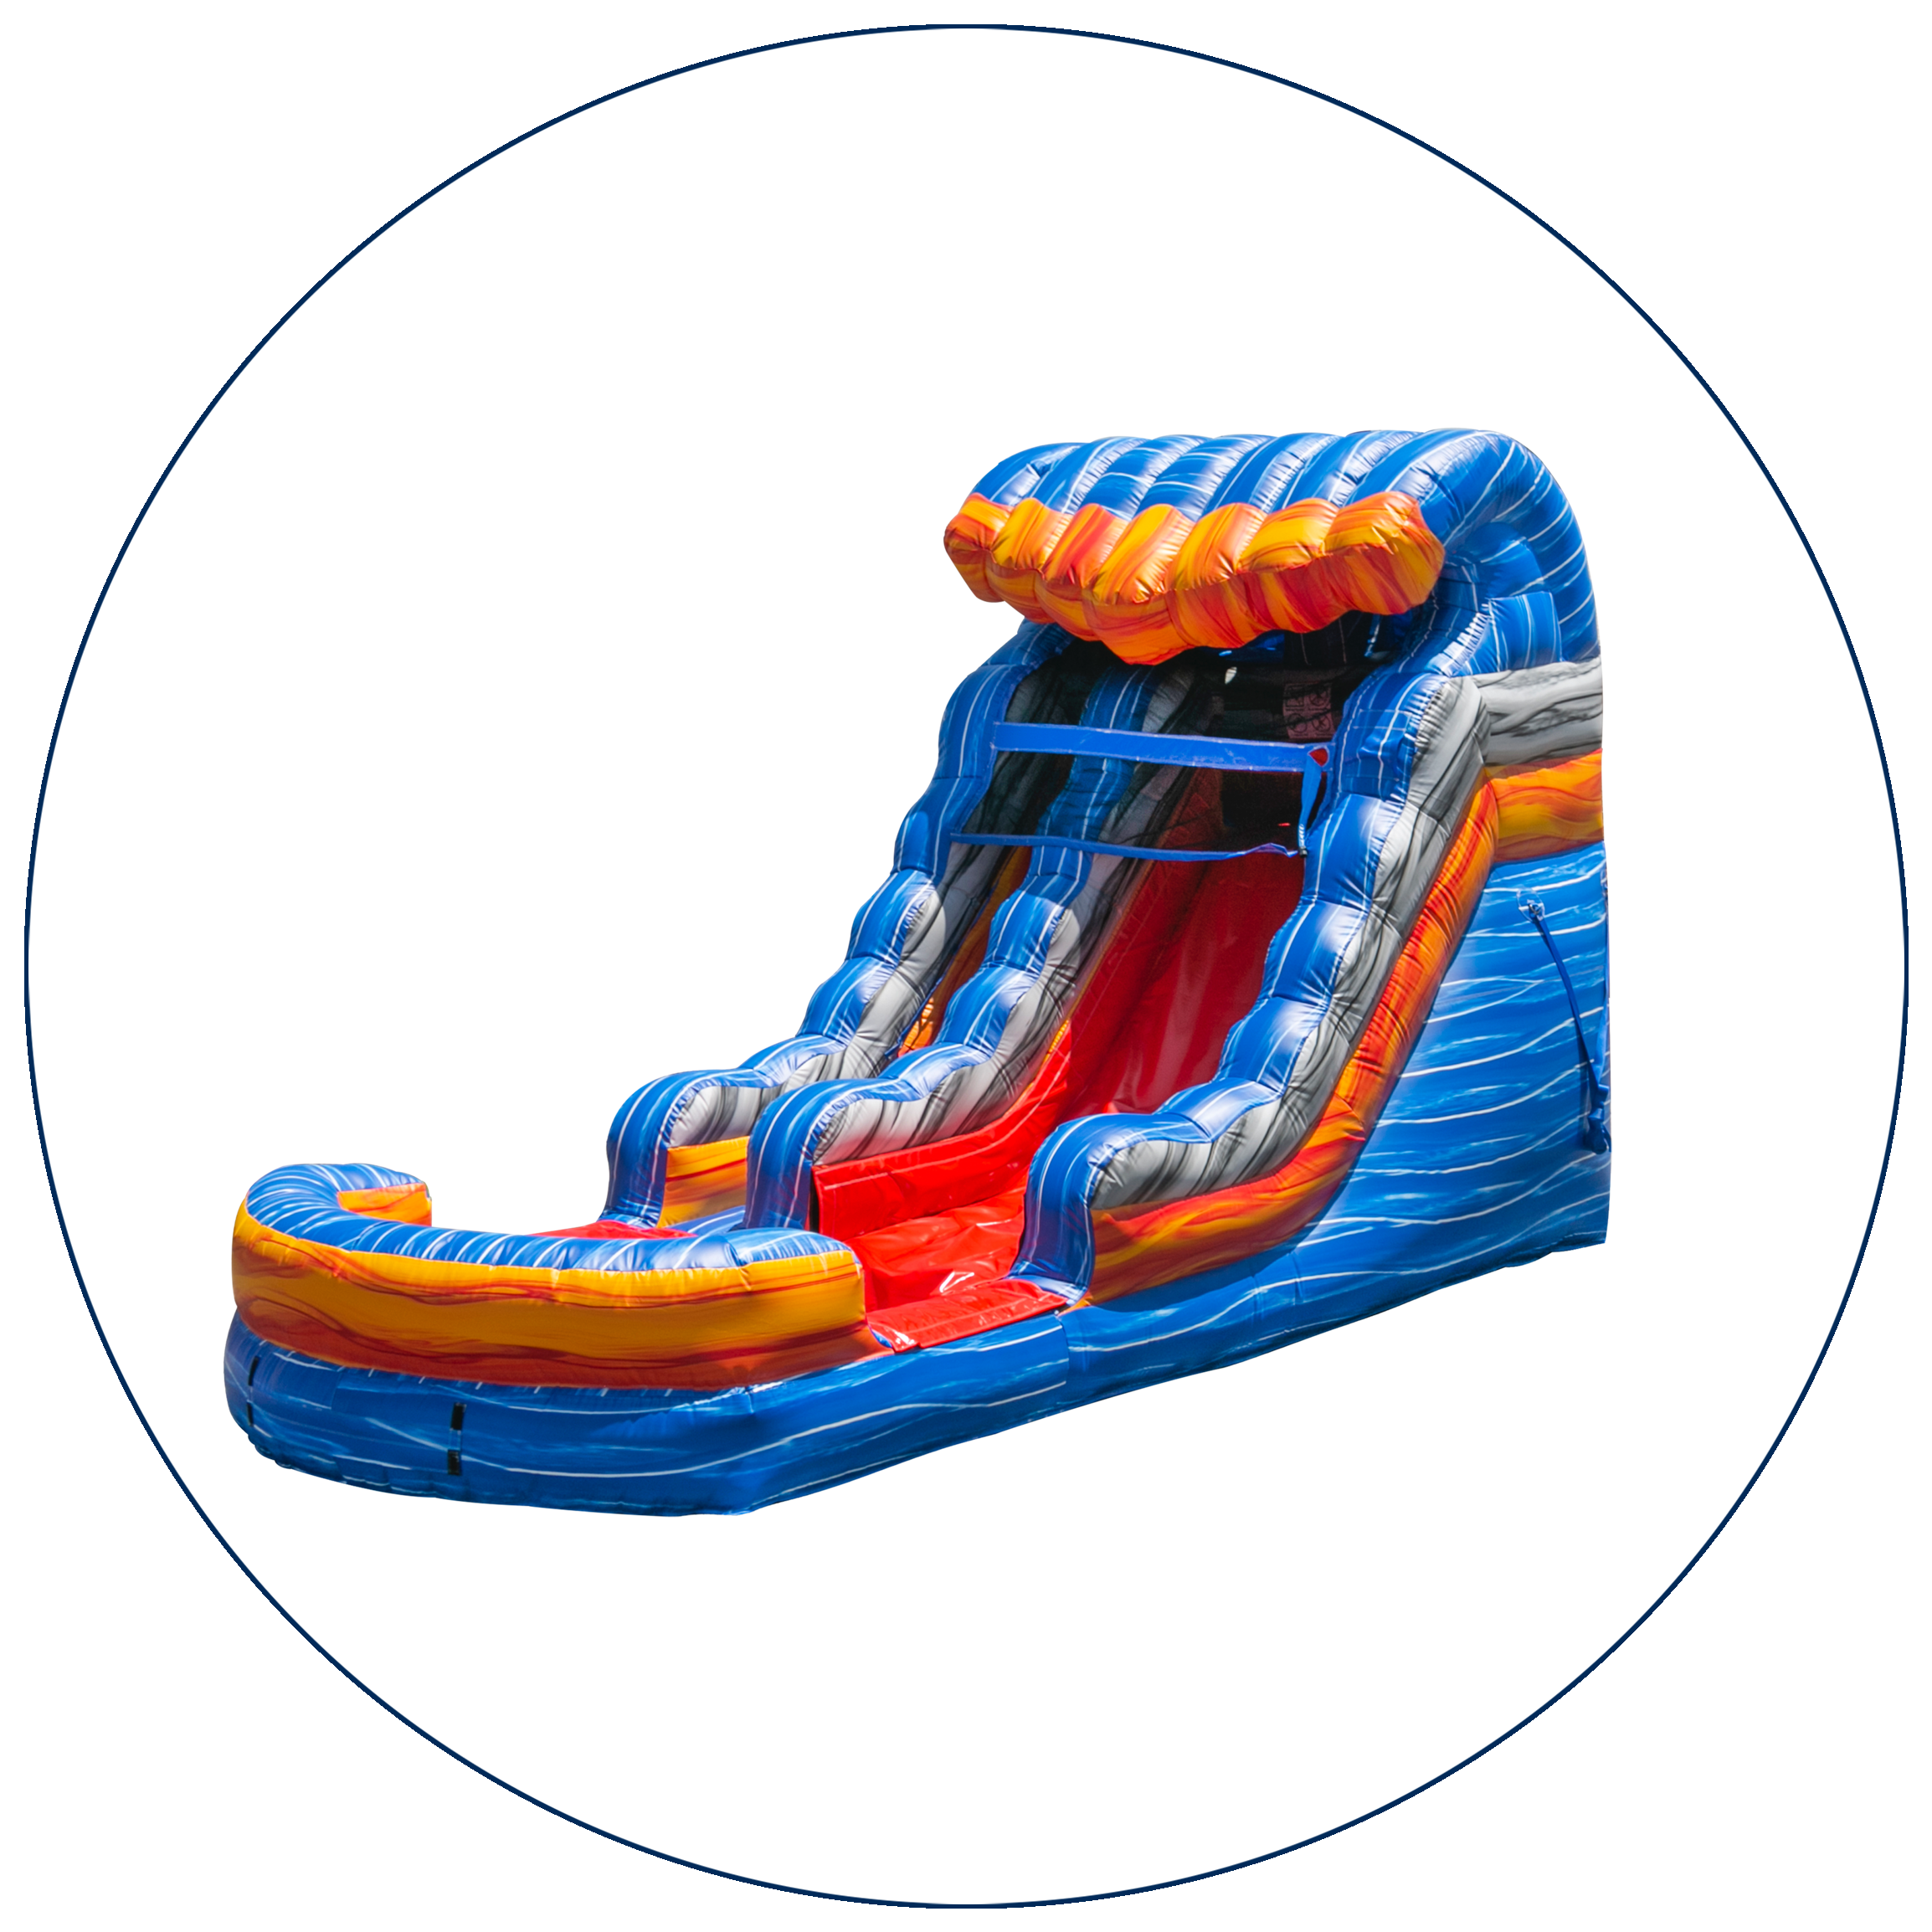 13 - 16 Ft. Water Slides